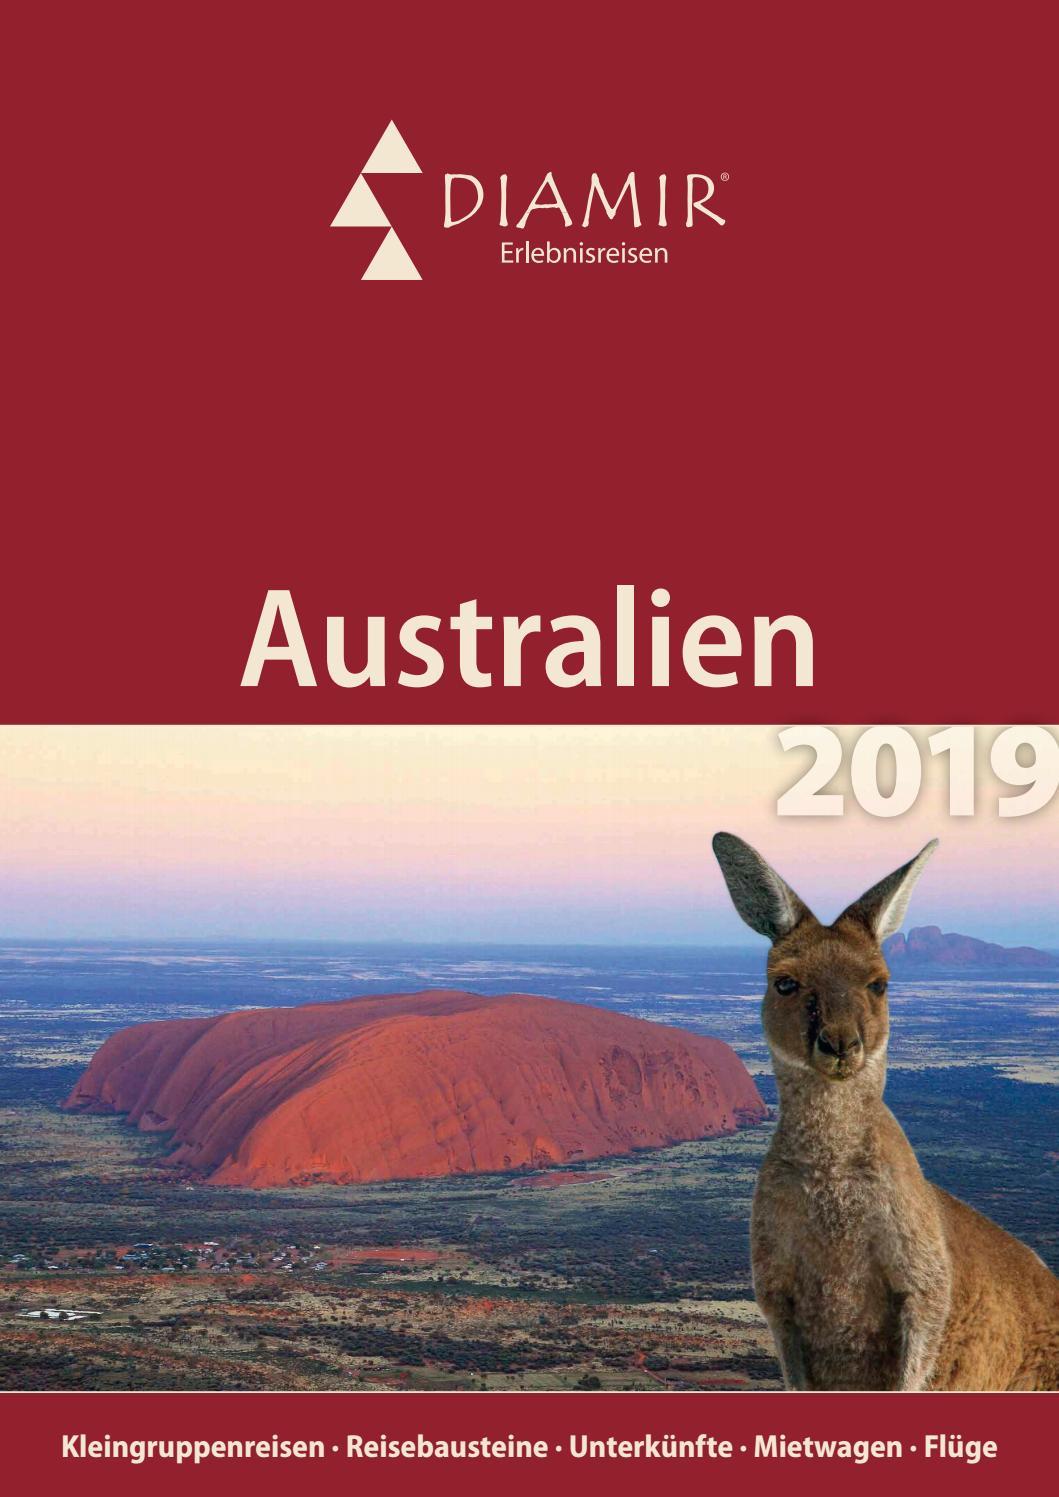 Diamir Ozeanien Australien Reisekatalog 2019 By Diamir